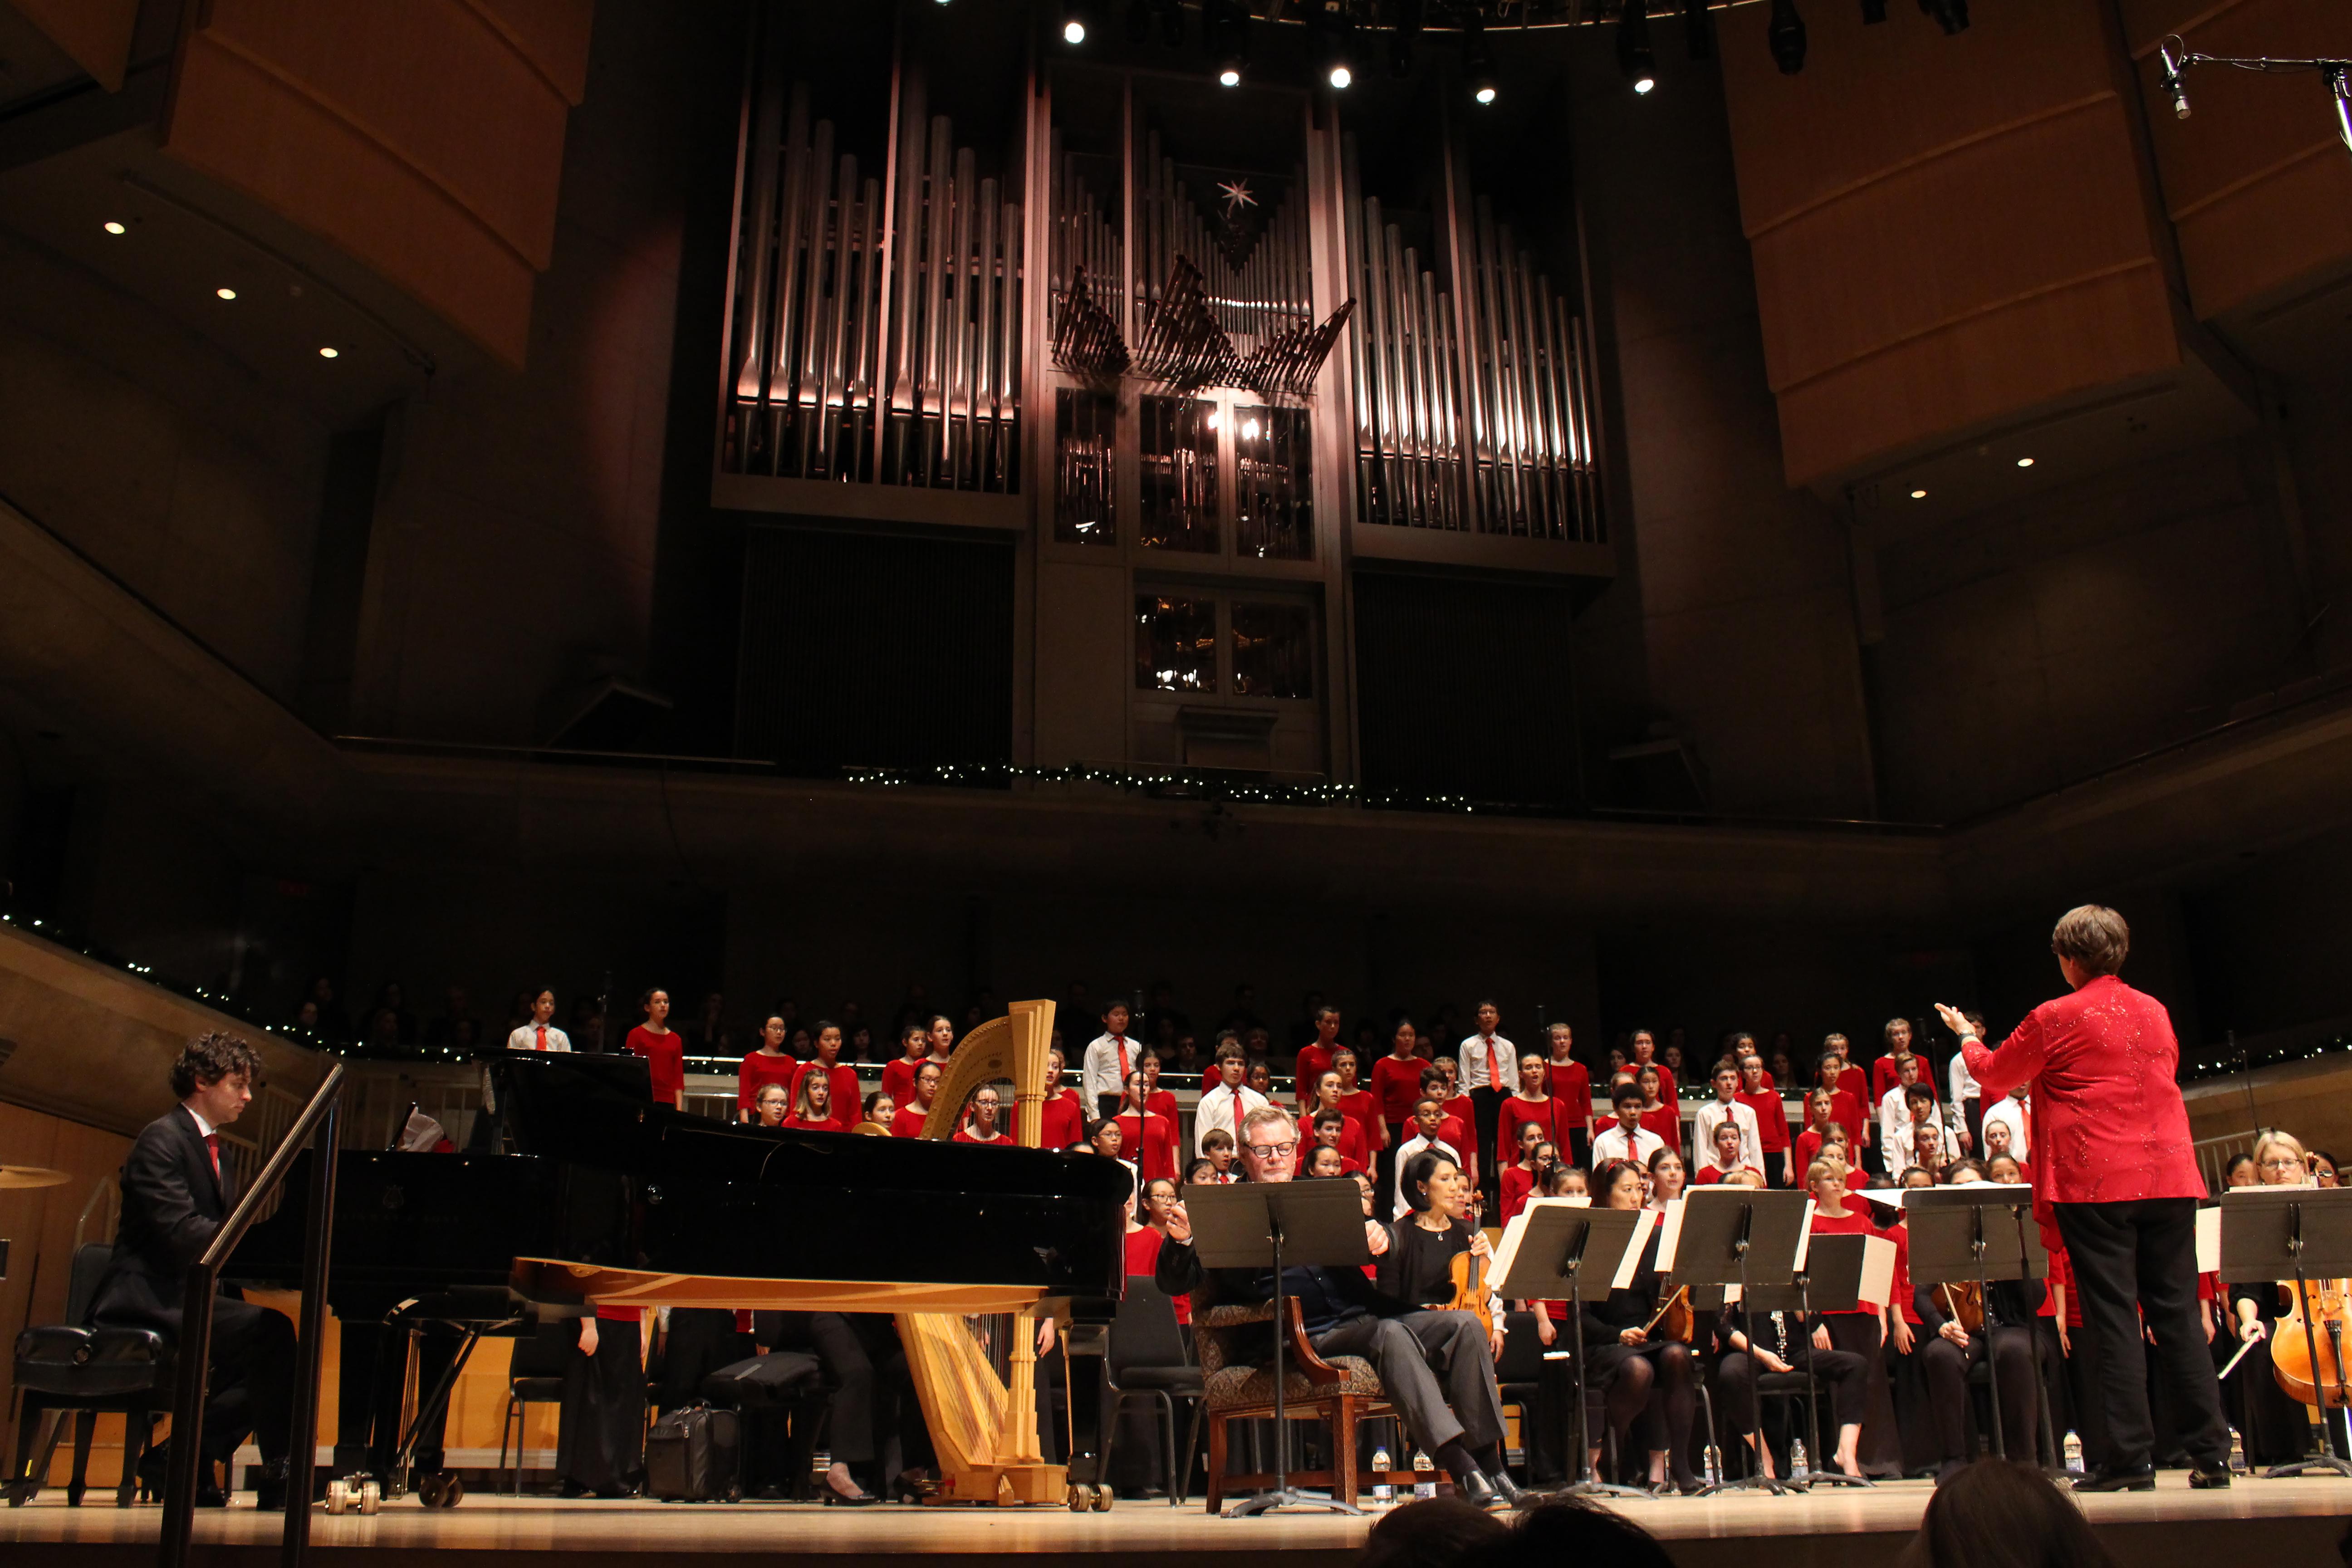 Toronto Children's Chorus | The WholeNote